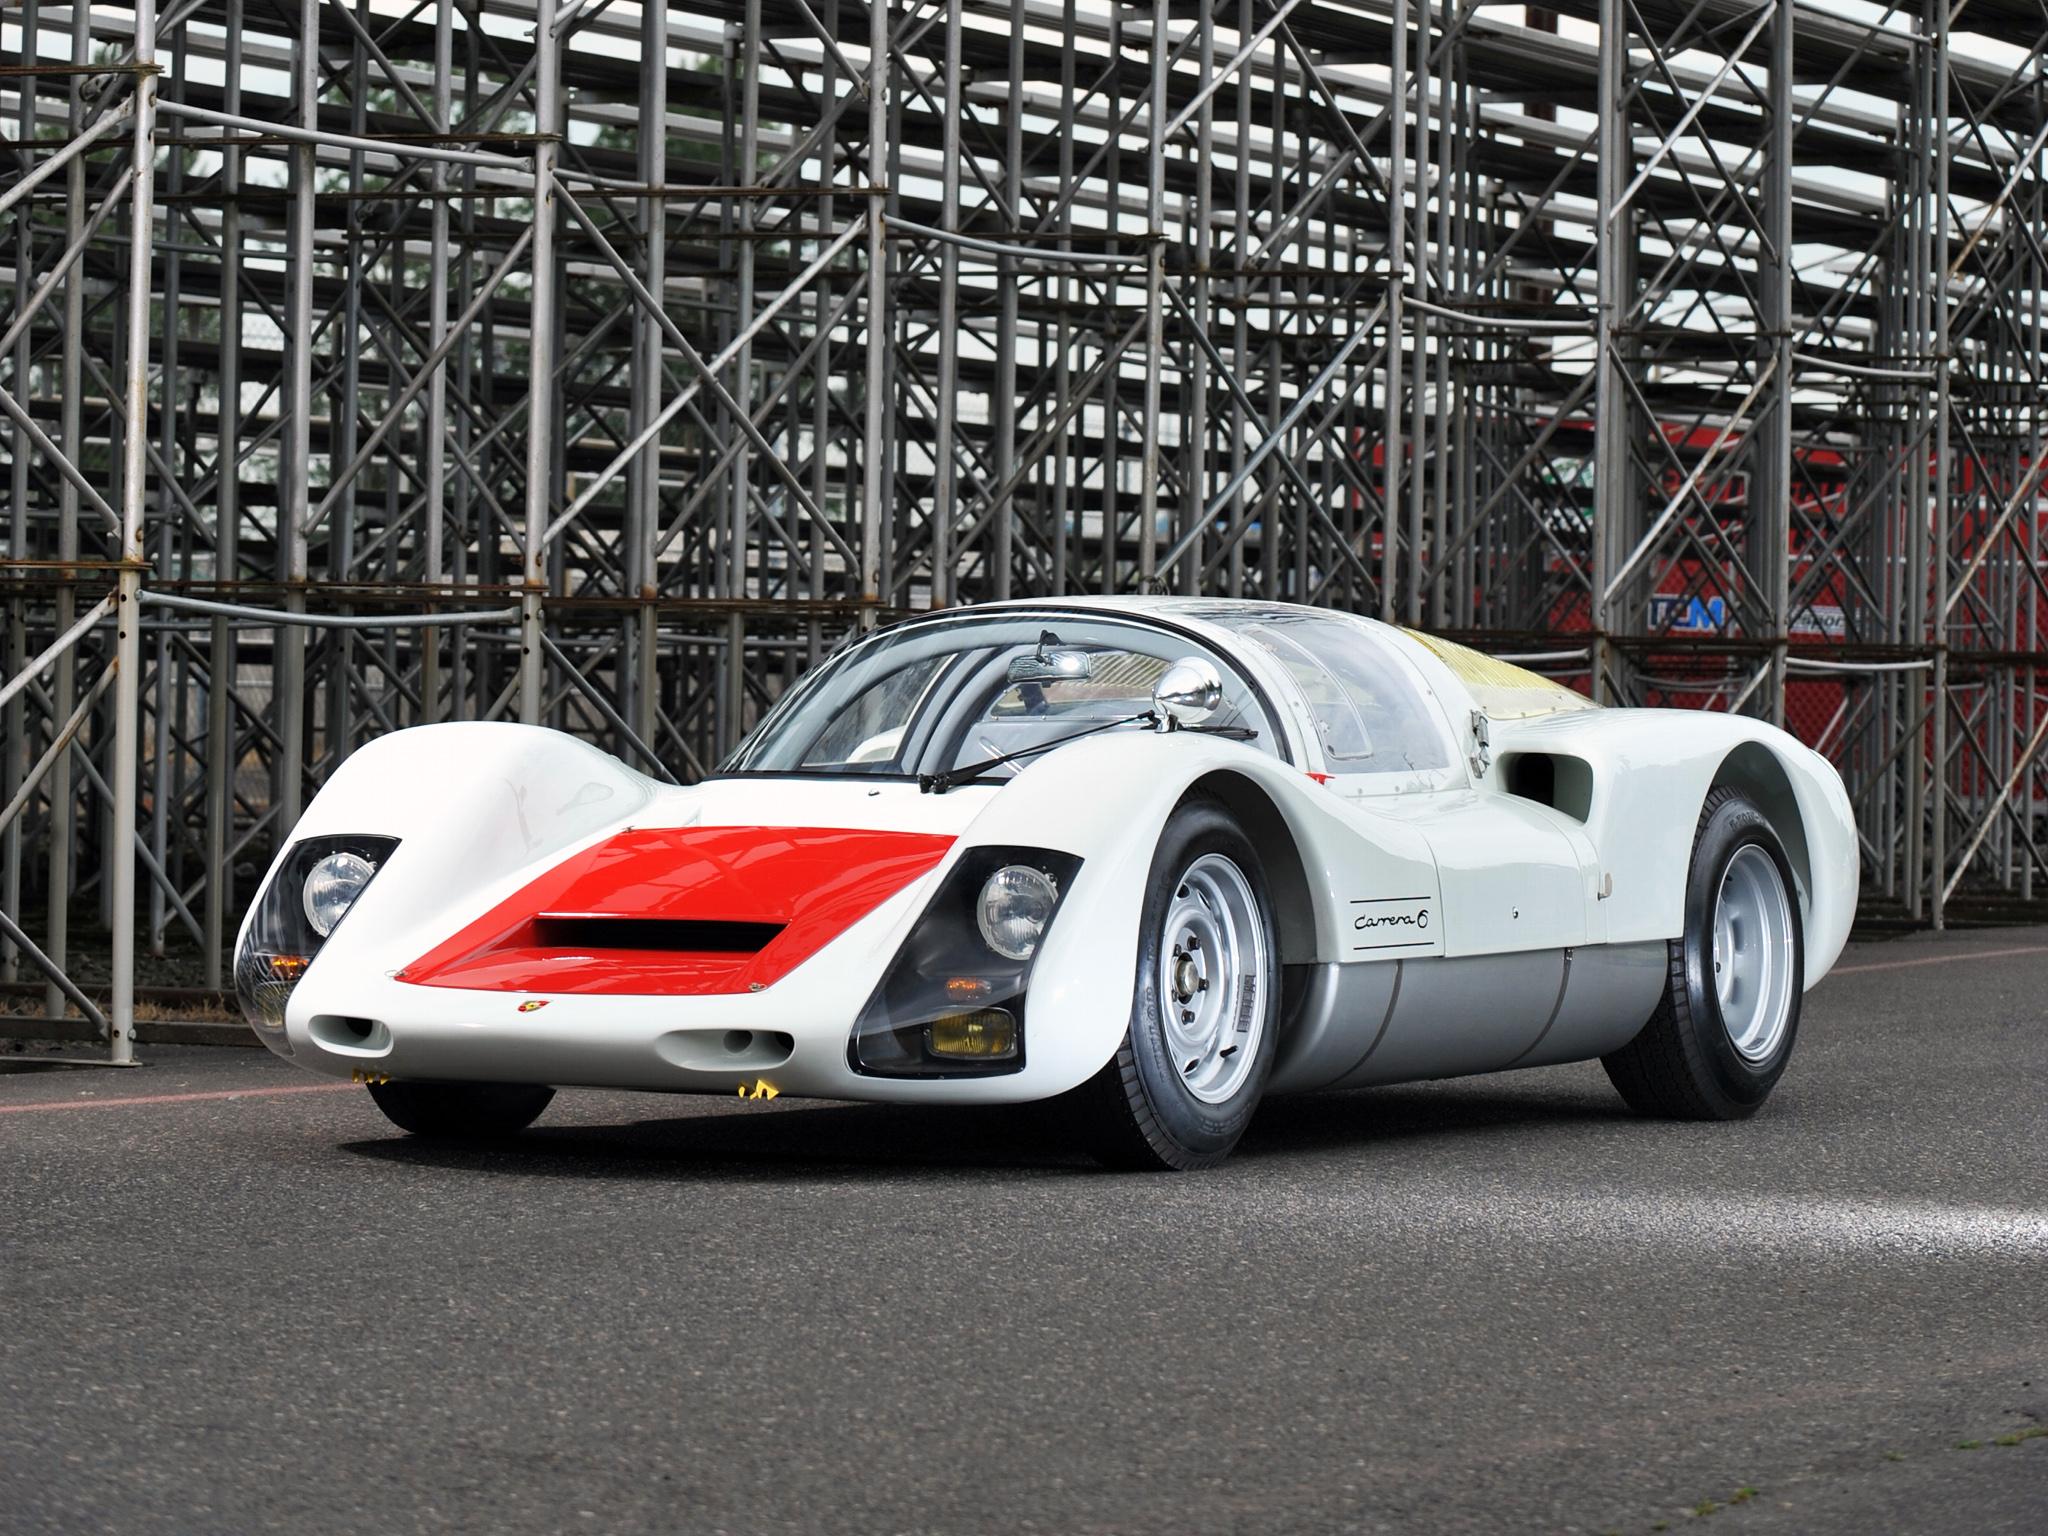 Porsche 906 Carrera 6 Kurzheck Coupe 1966 Fondos De